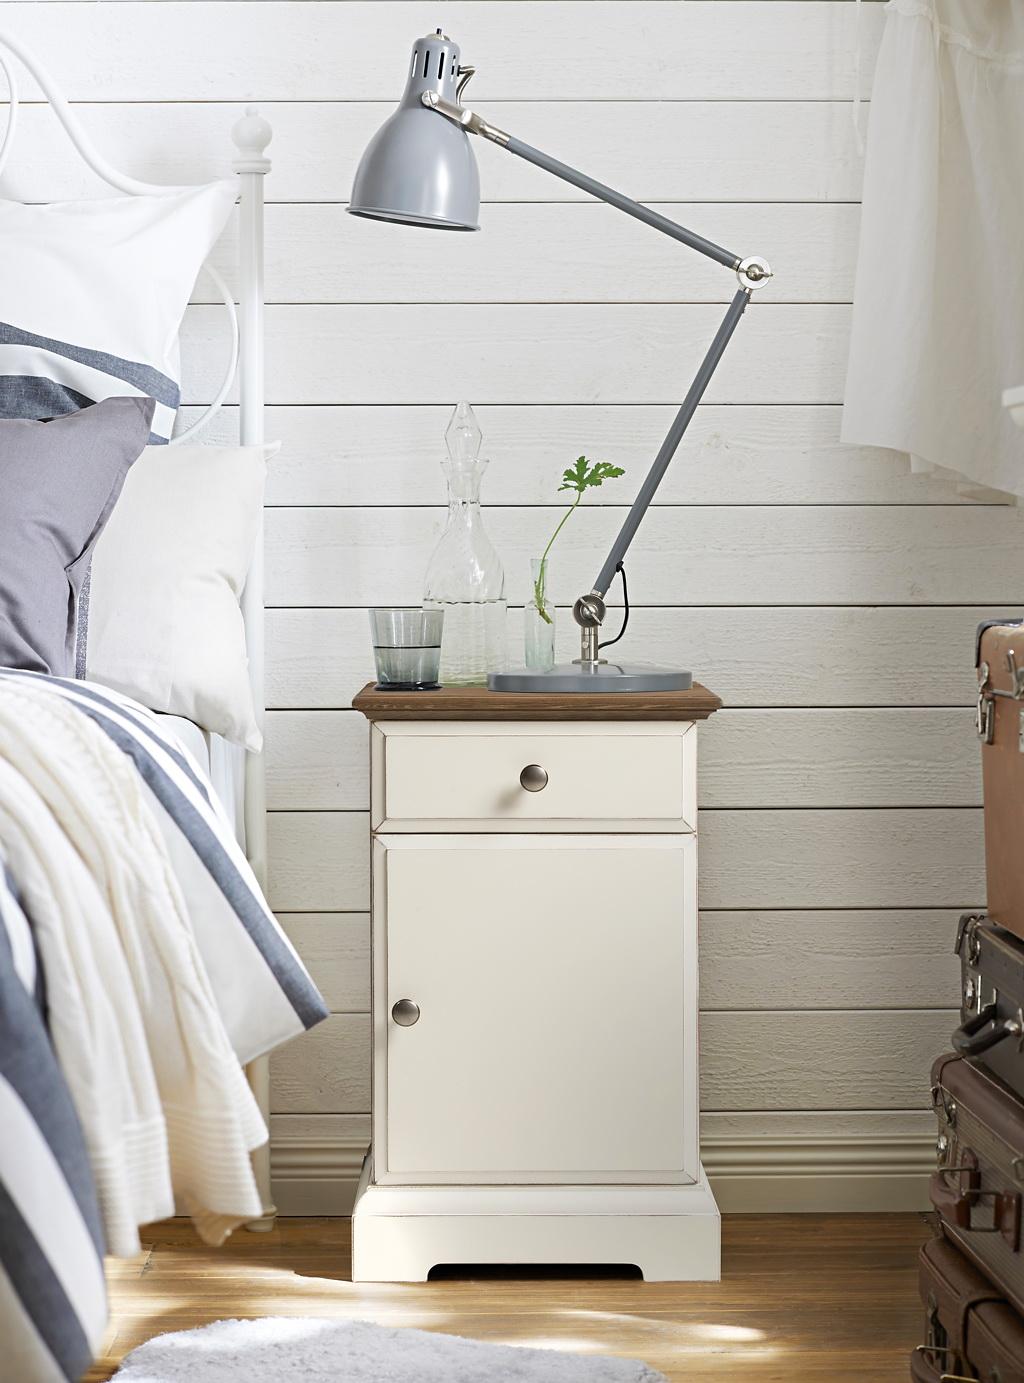 Ikea lim2014 8